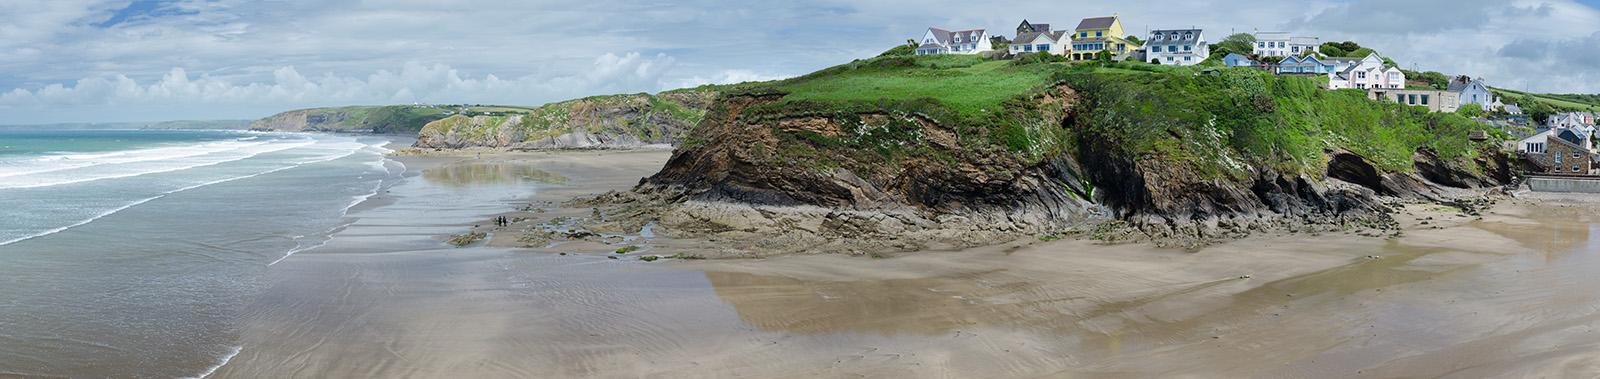 druidstone_haven_marloes-panorama4-2